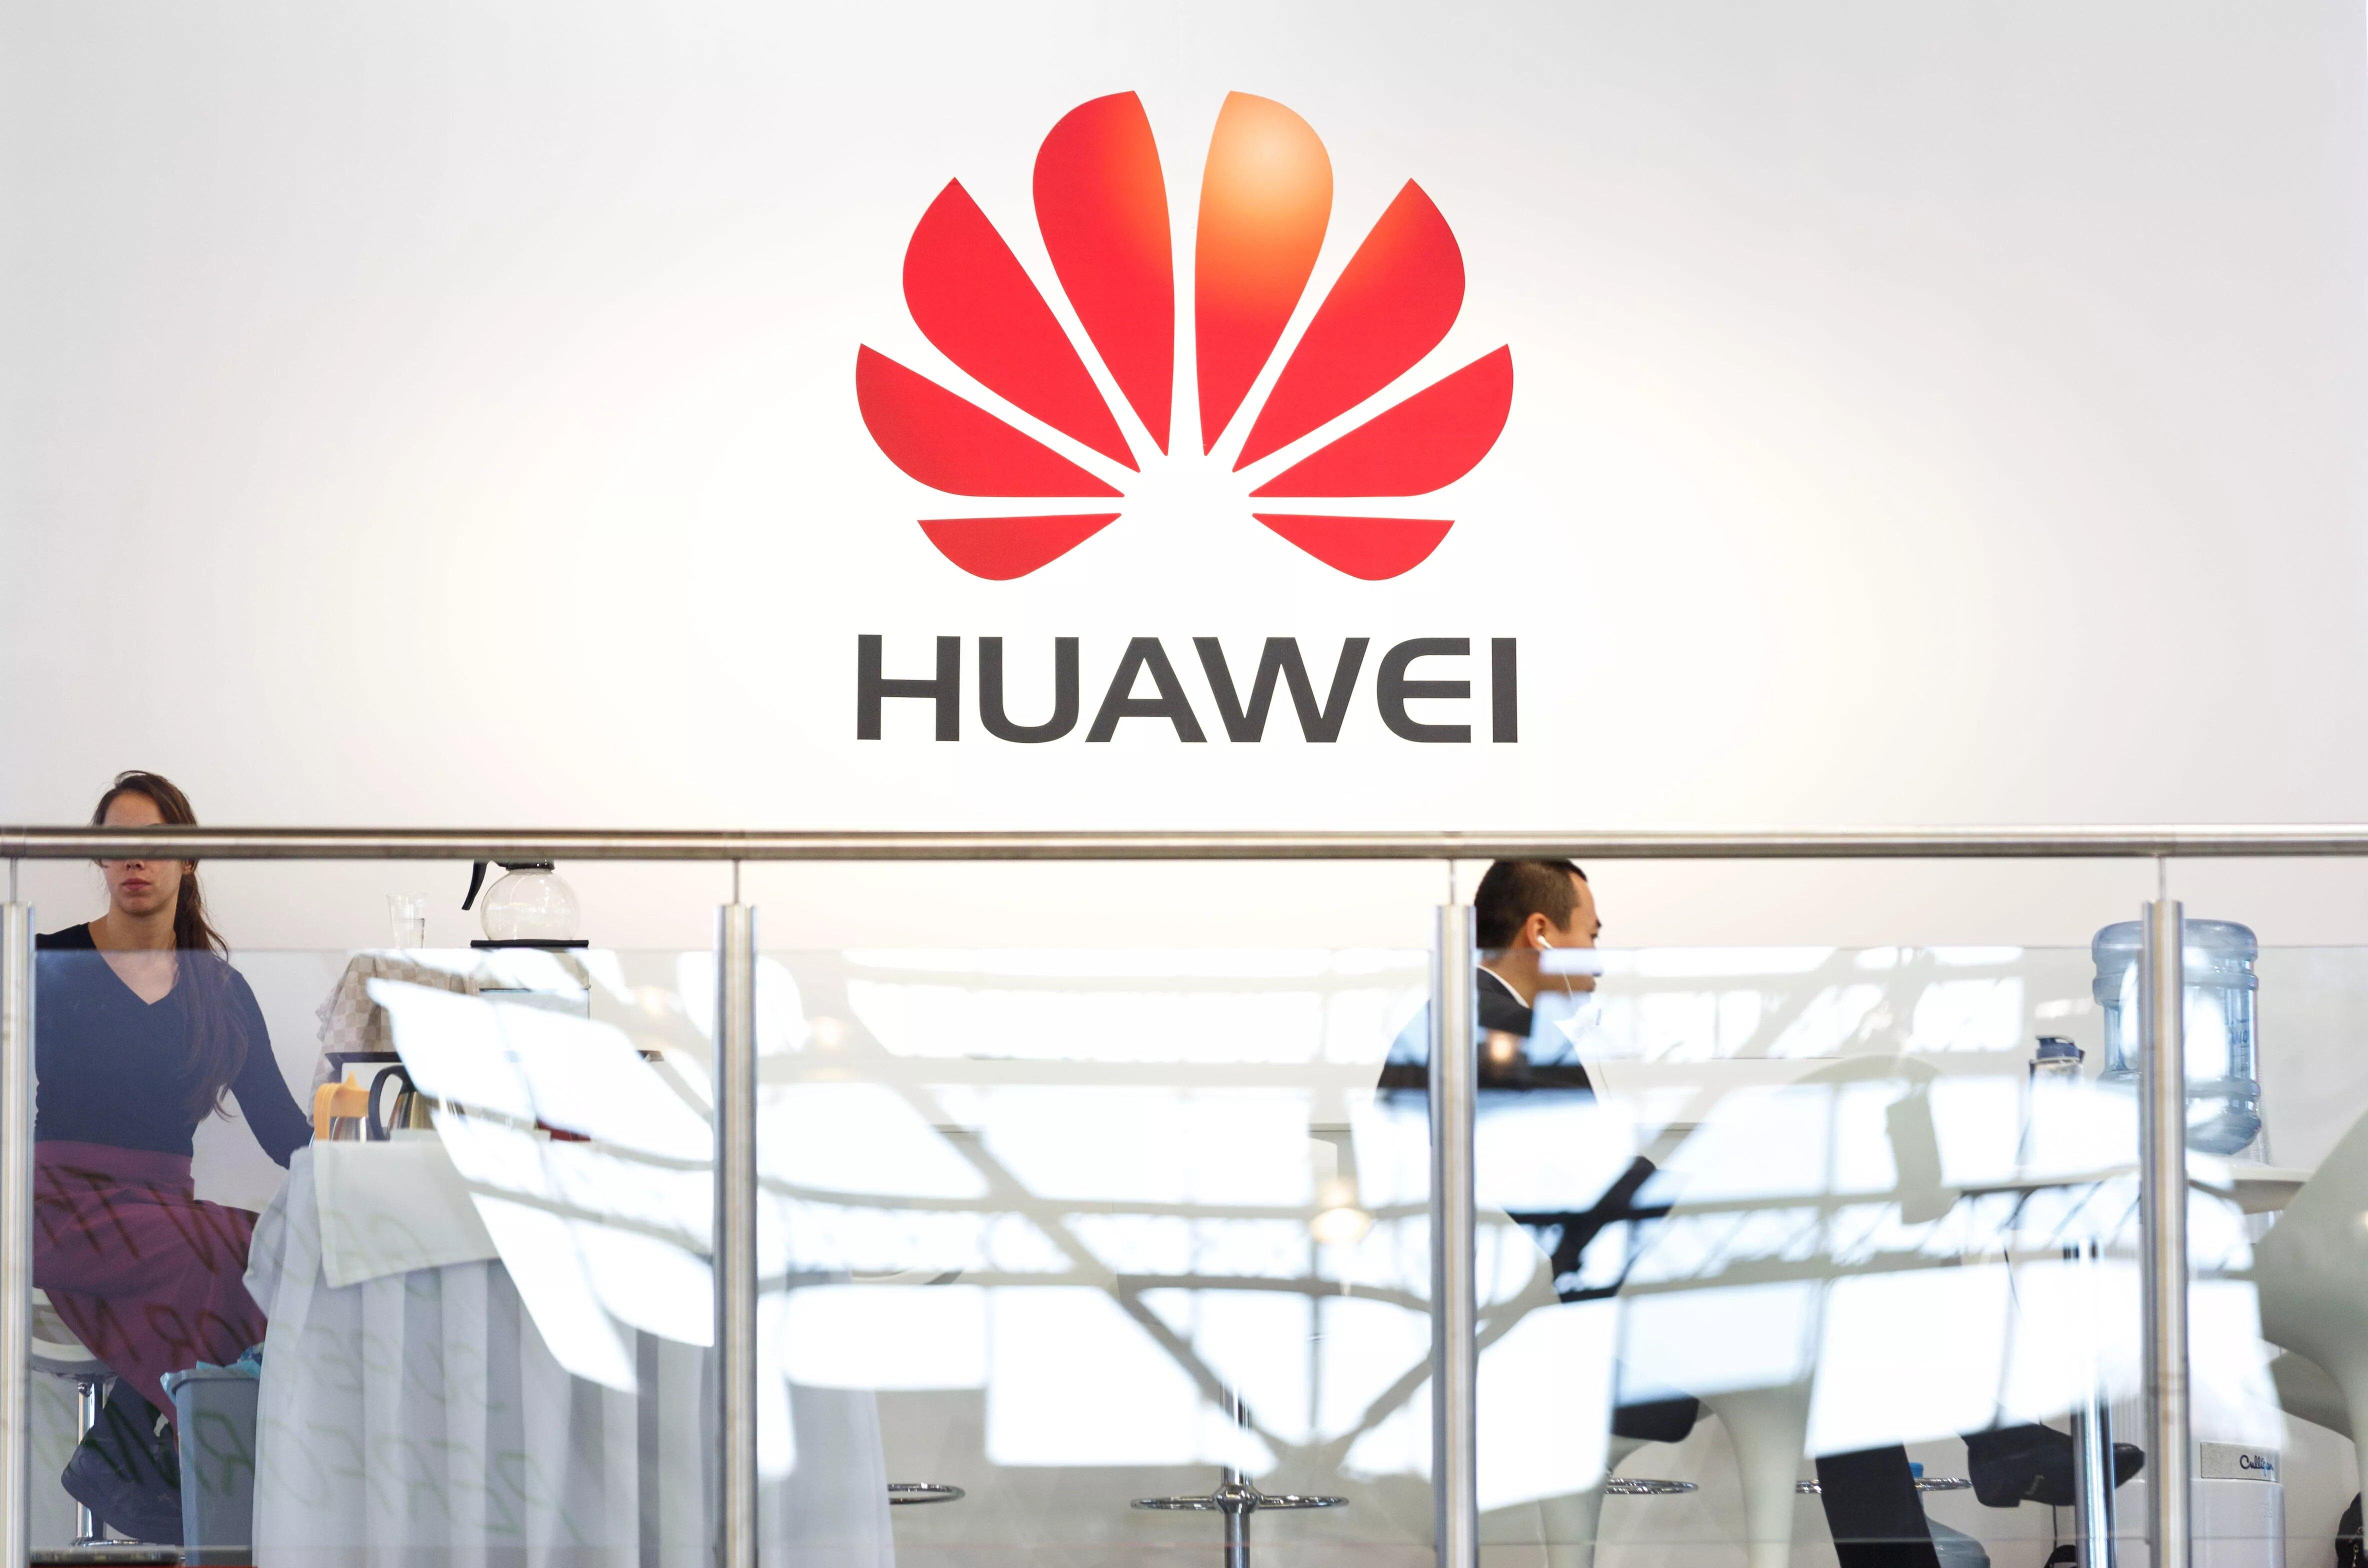 Pérdida para Google si Huawei abandona Android